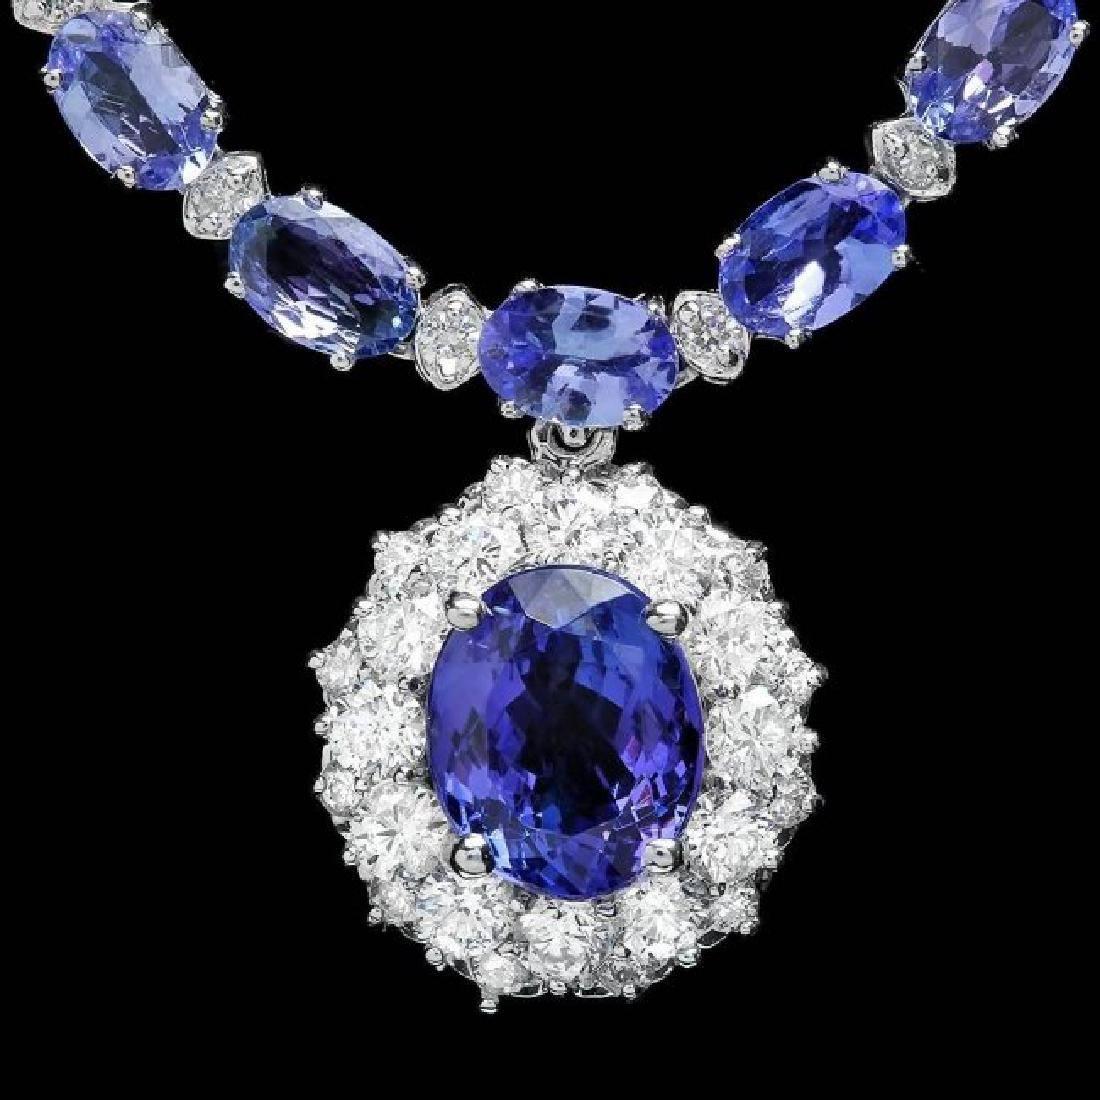 14k Gold 25.5ct Tanzanite 3.00ct Diamond Necklace